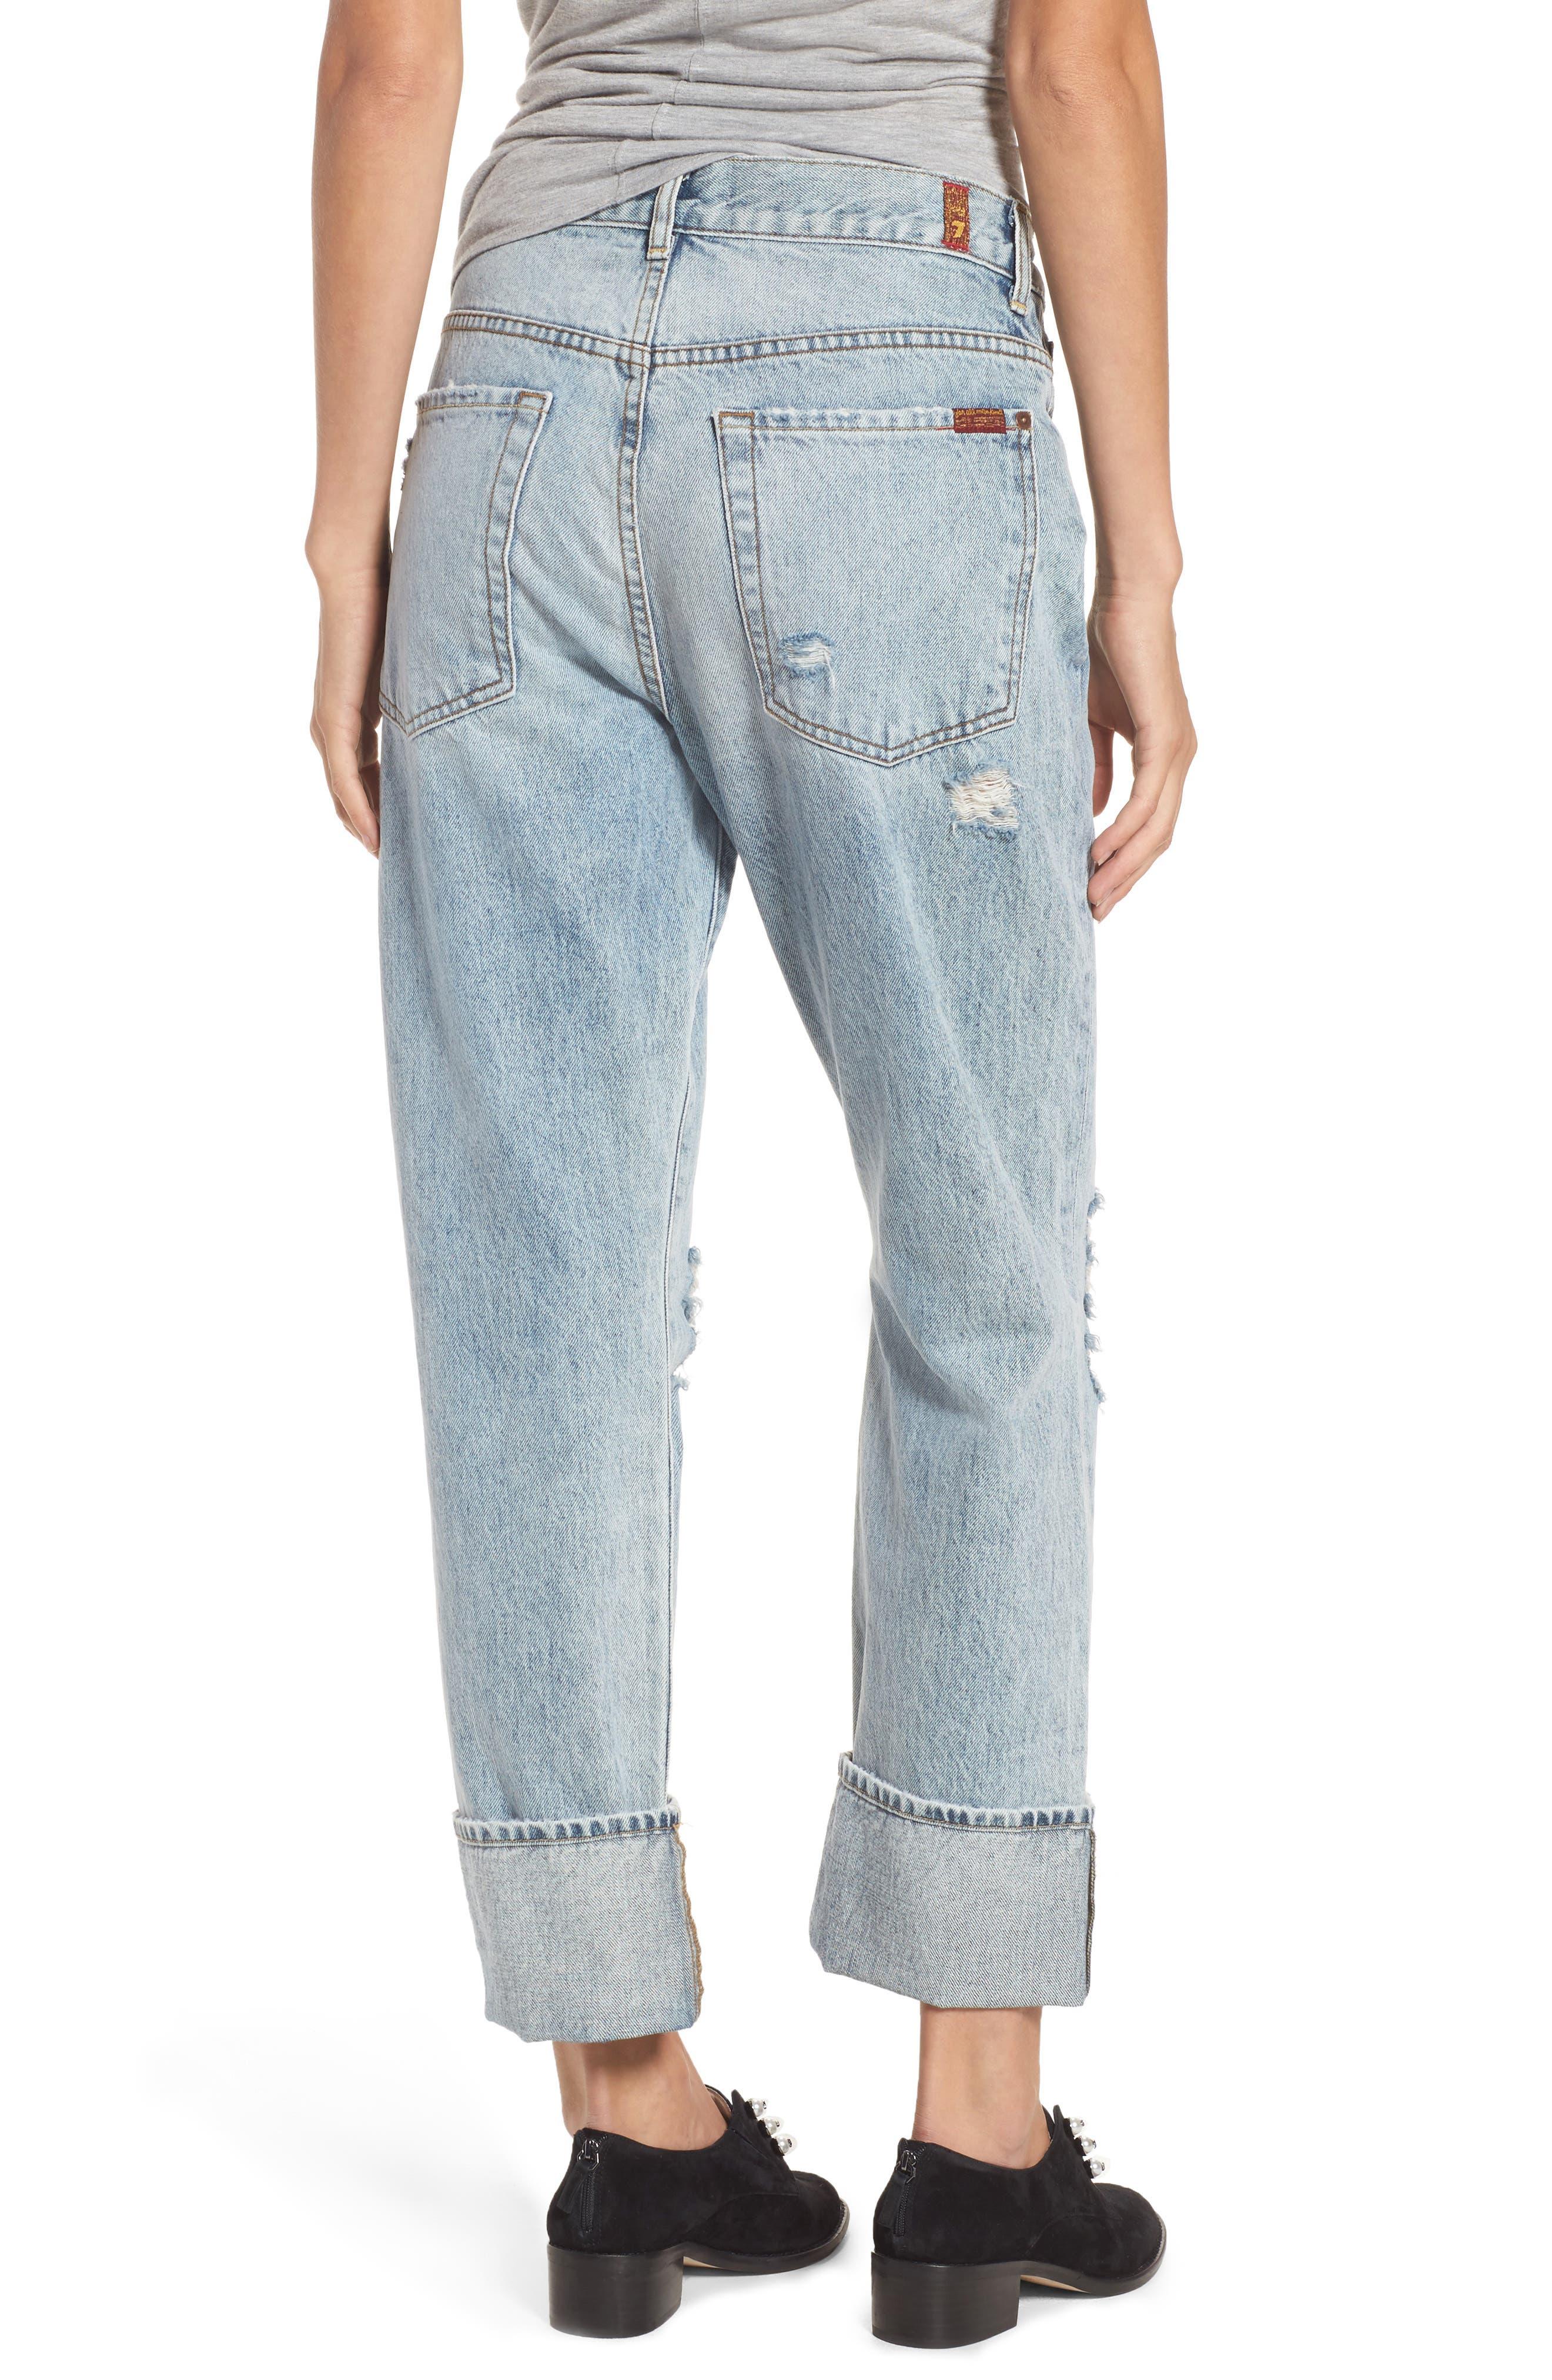 Alternate Image 3  - 7 For All Mankind® Rickie High Waist Boyfriend Jeans (Mineral Desert Springs)